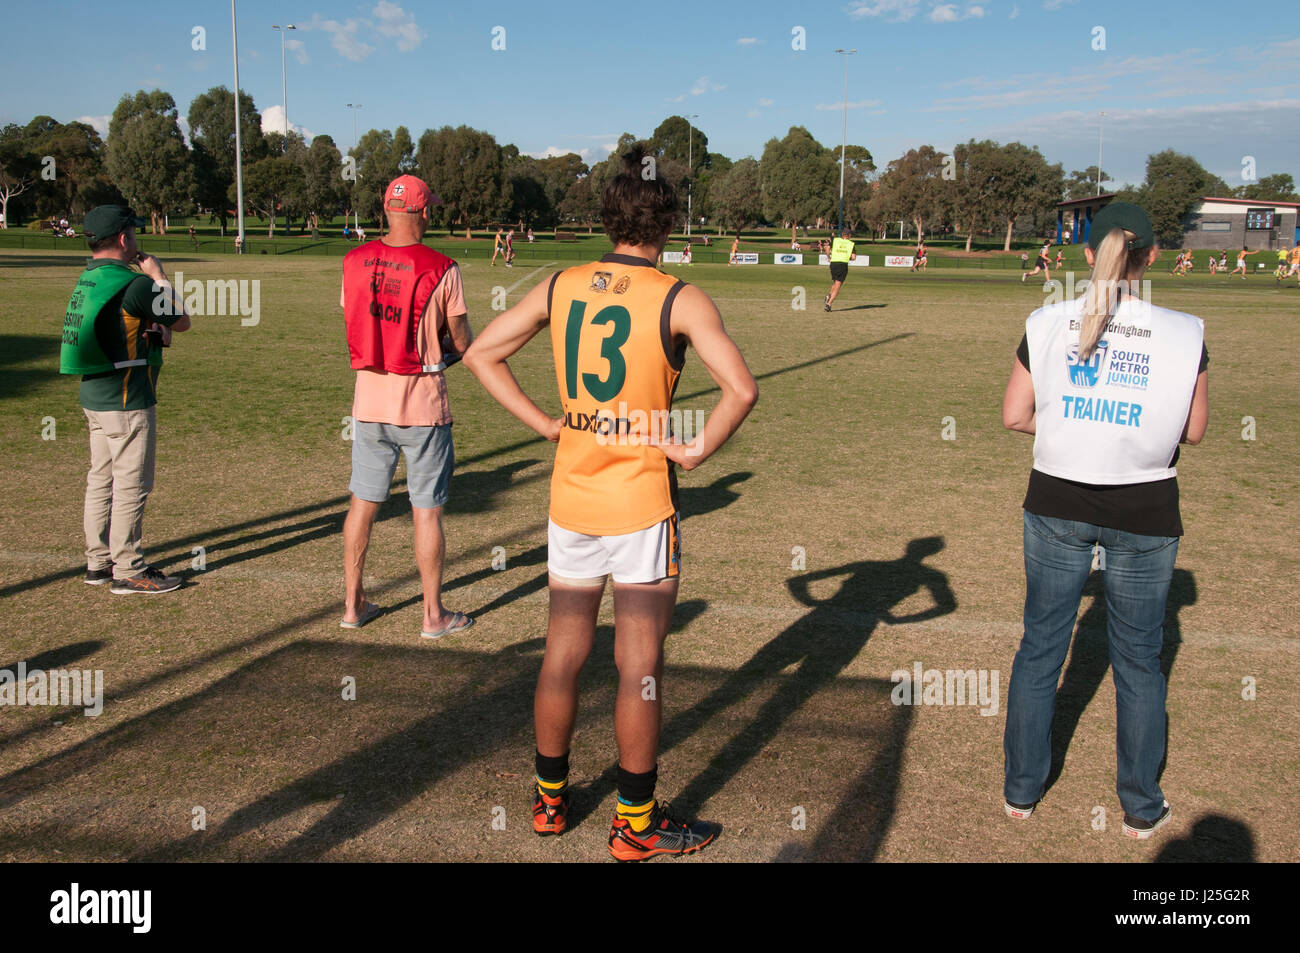 Team officials watch an Amateur Australian Rules football match in suburban Melbourne, Australia - Stock Image